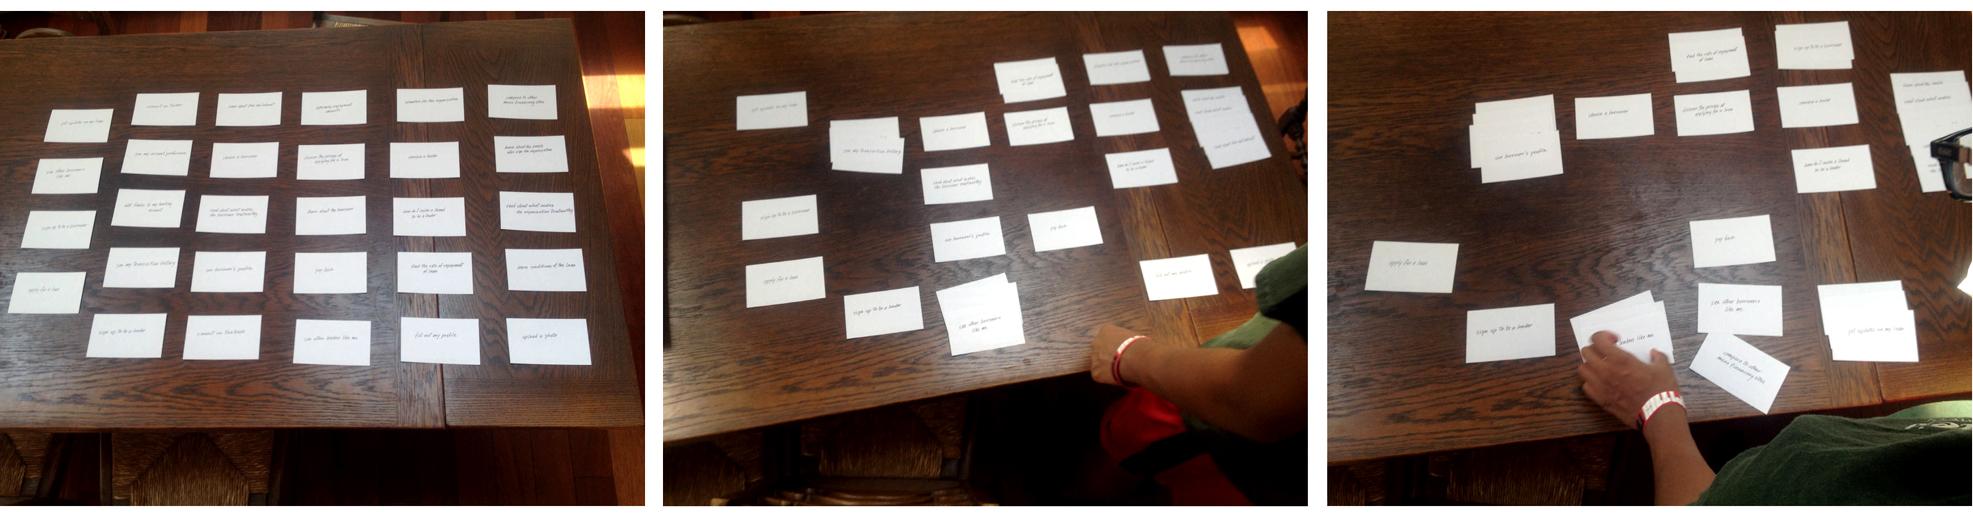 card-sorting.jpg